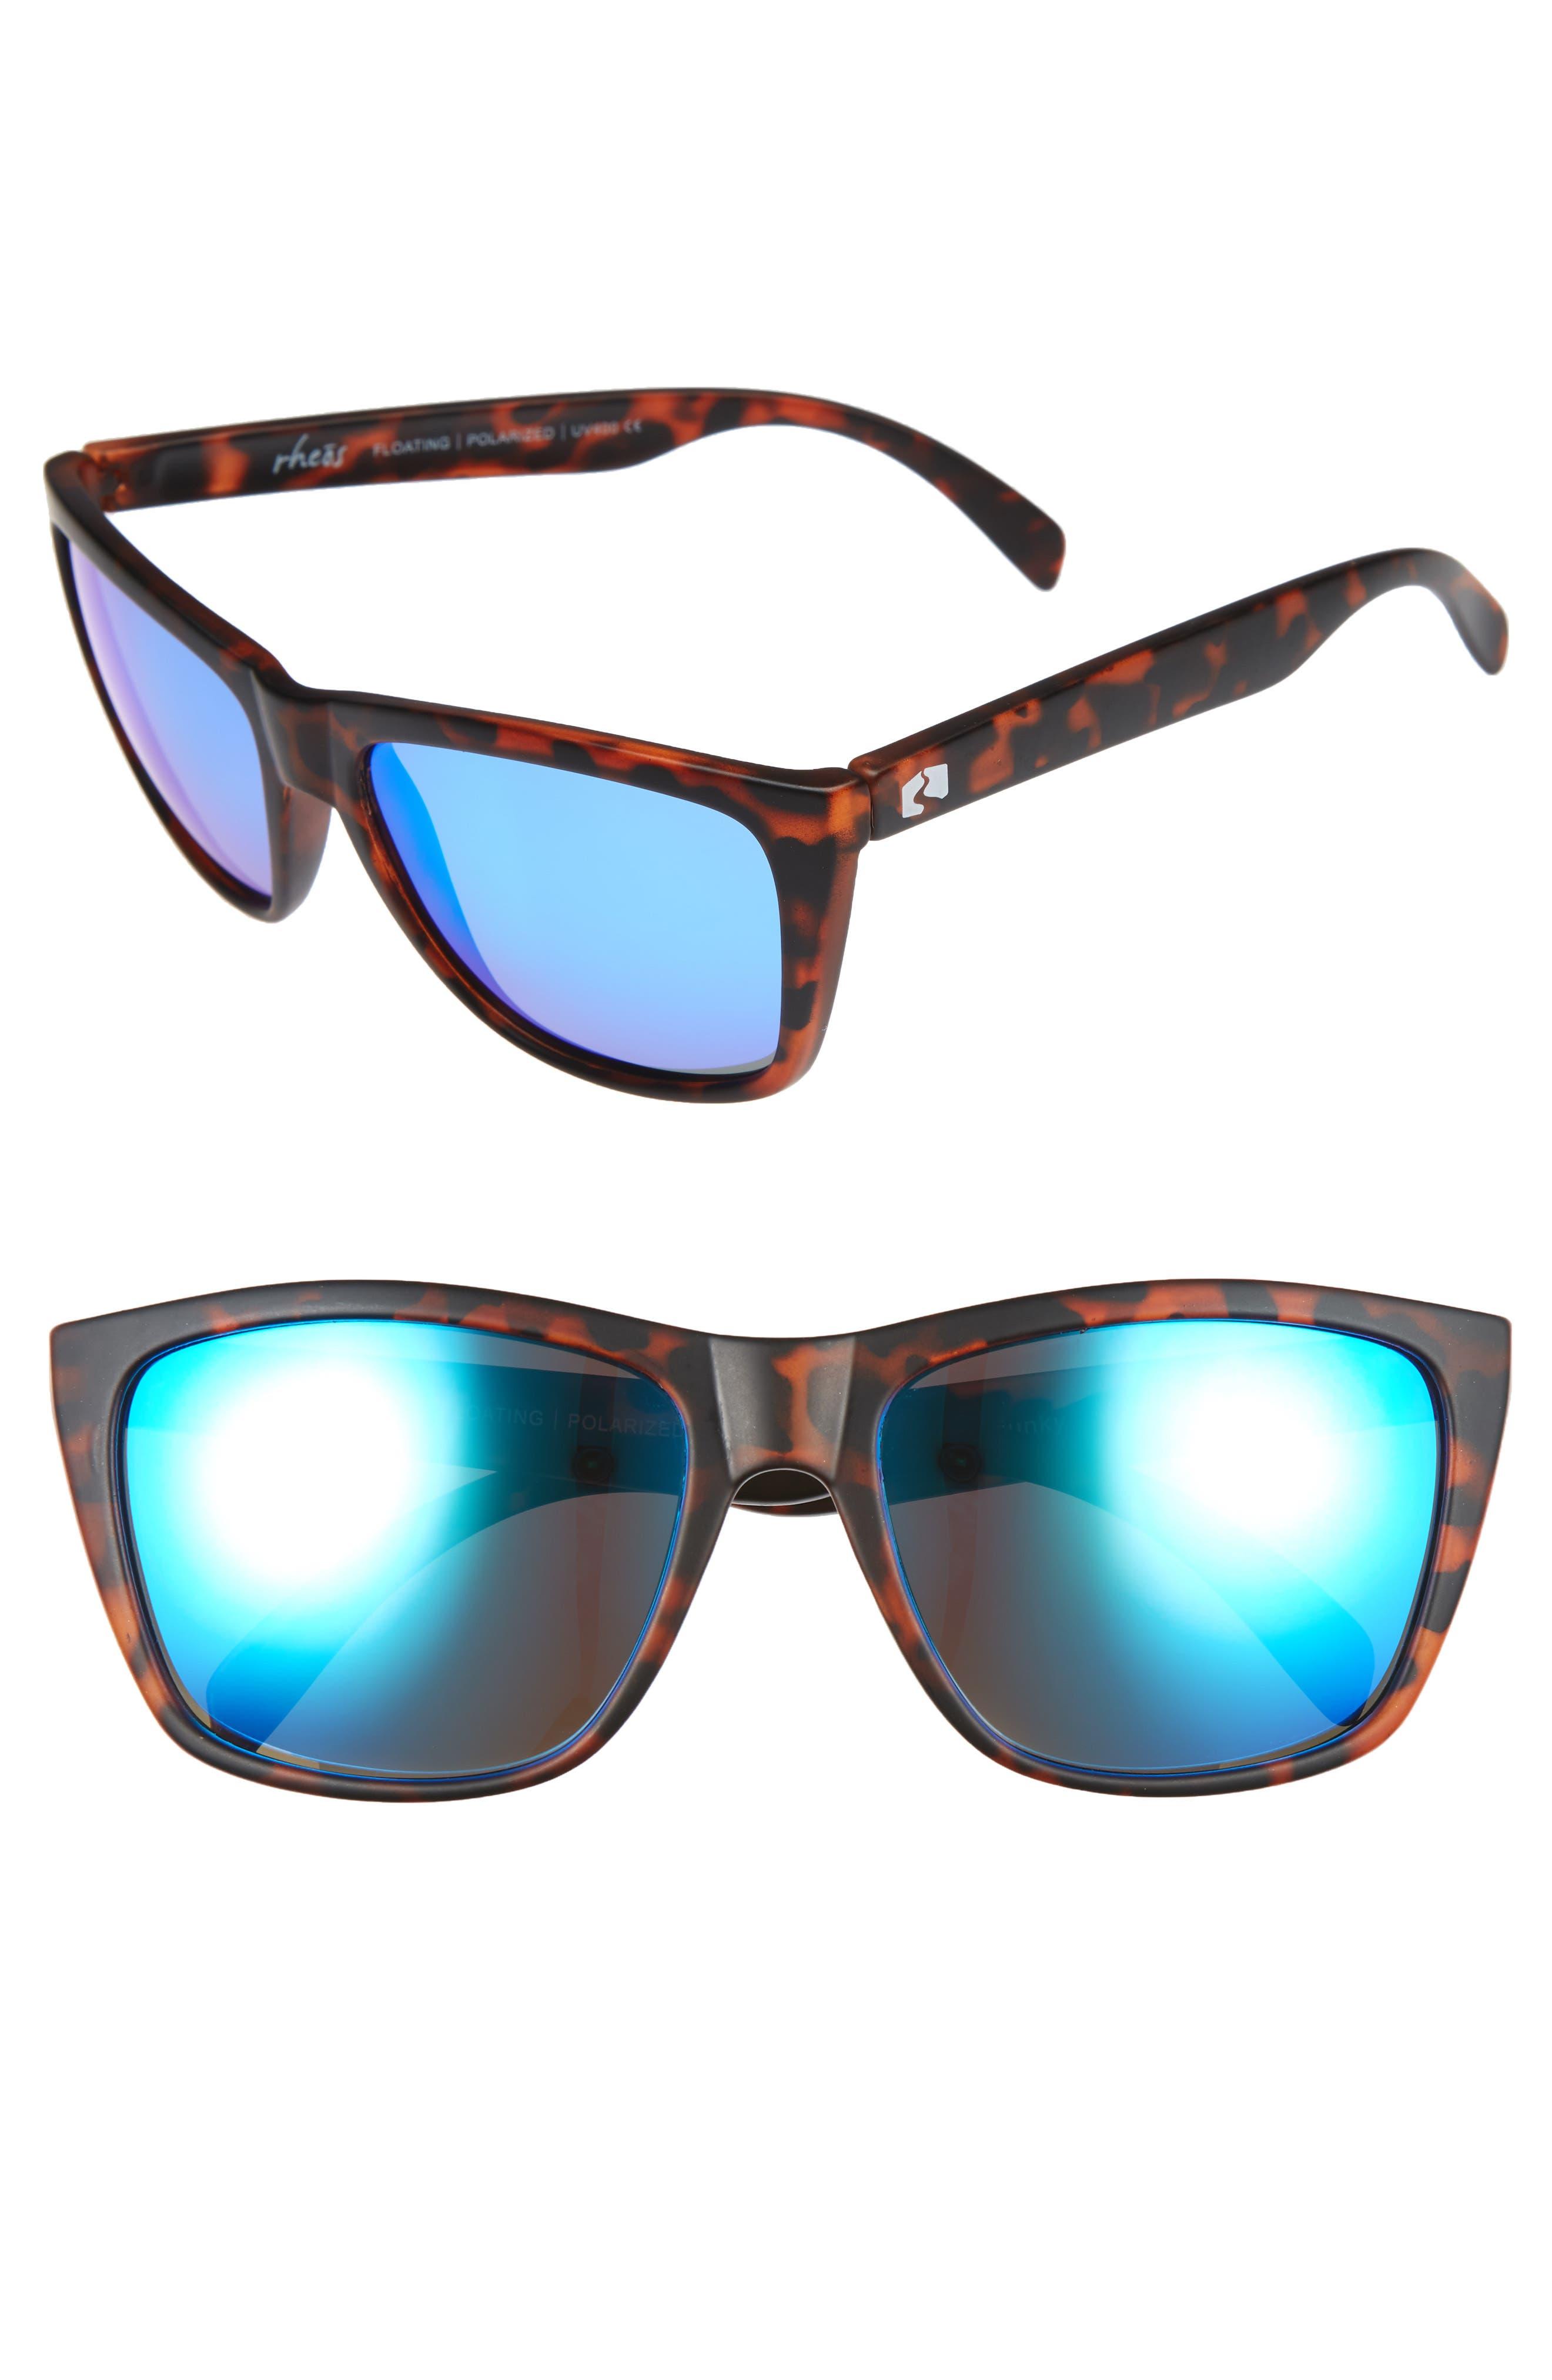 Sapelos Floating 61mm Polarized Sunglasses,                             Main thumbnail 1, color,                             Tortoise/ Marine